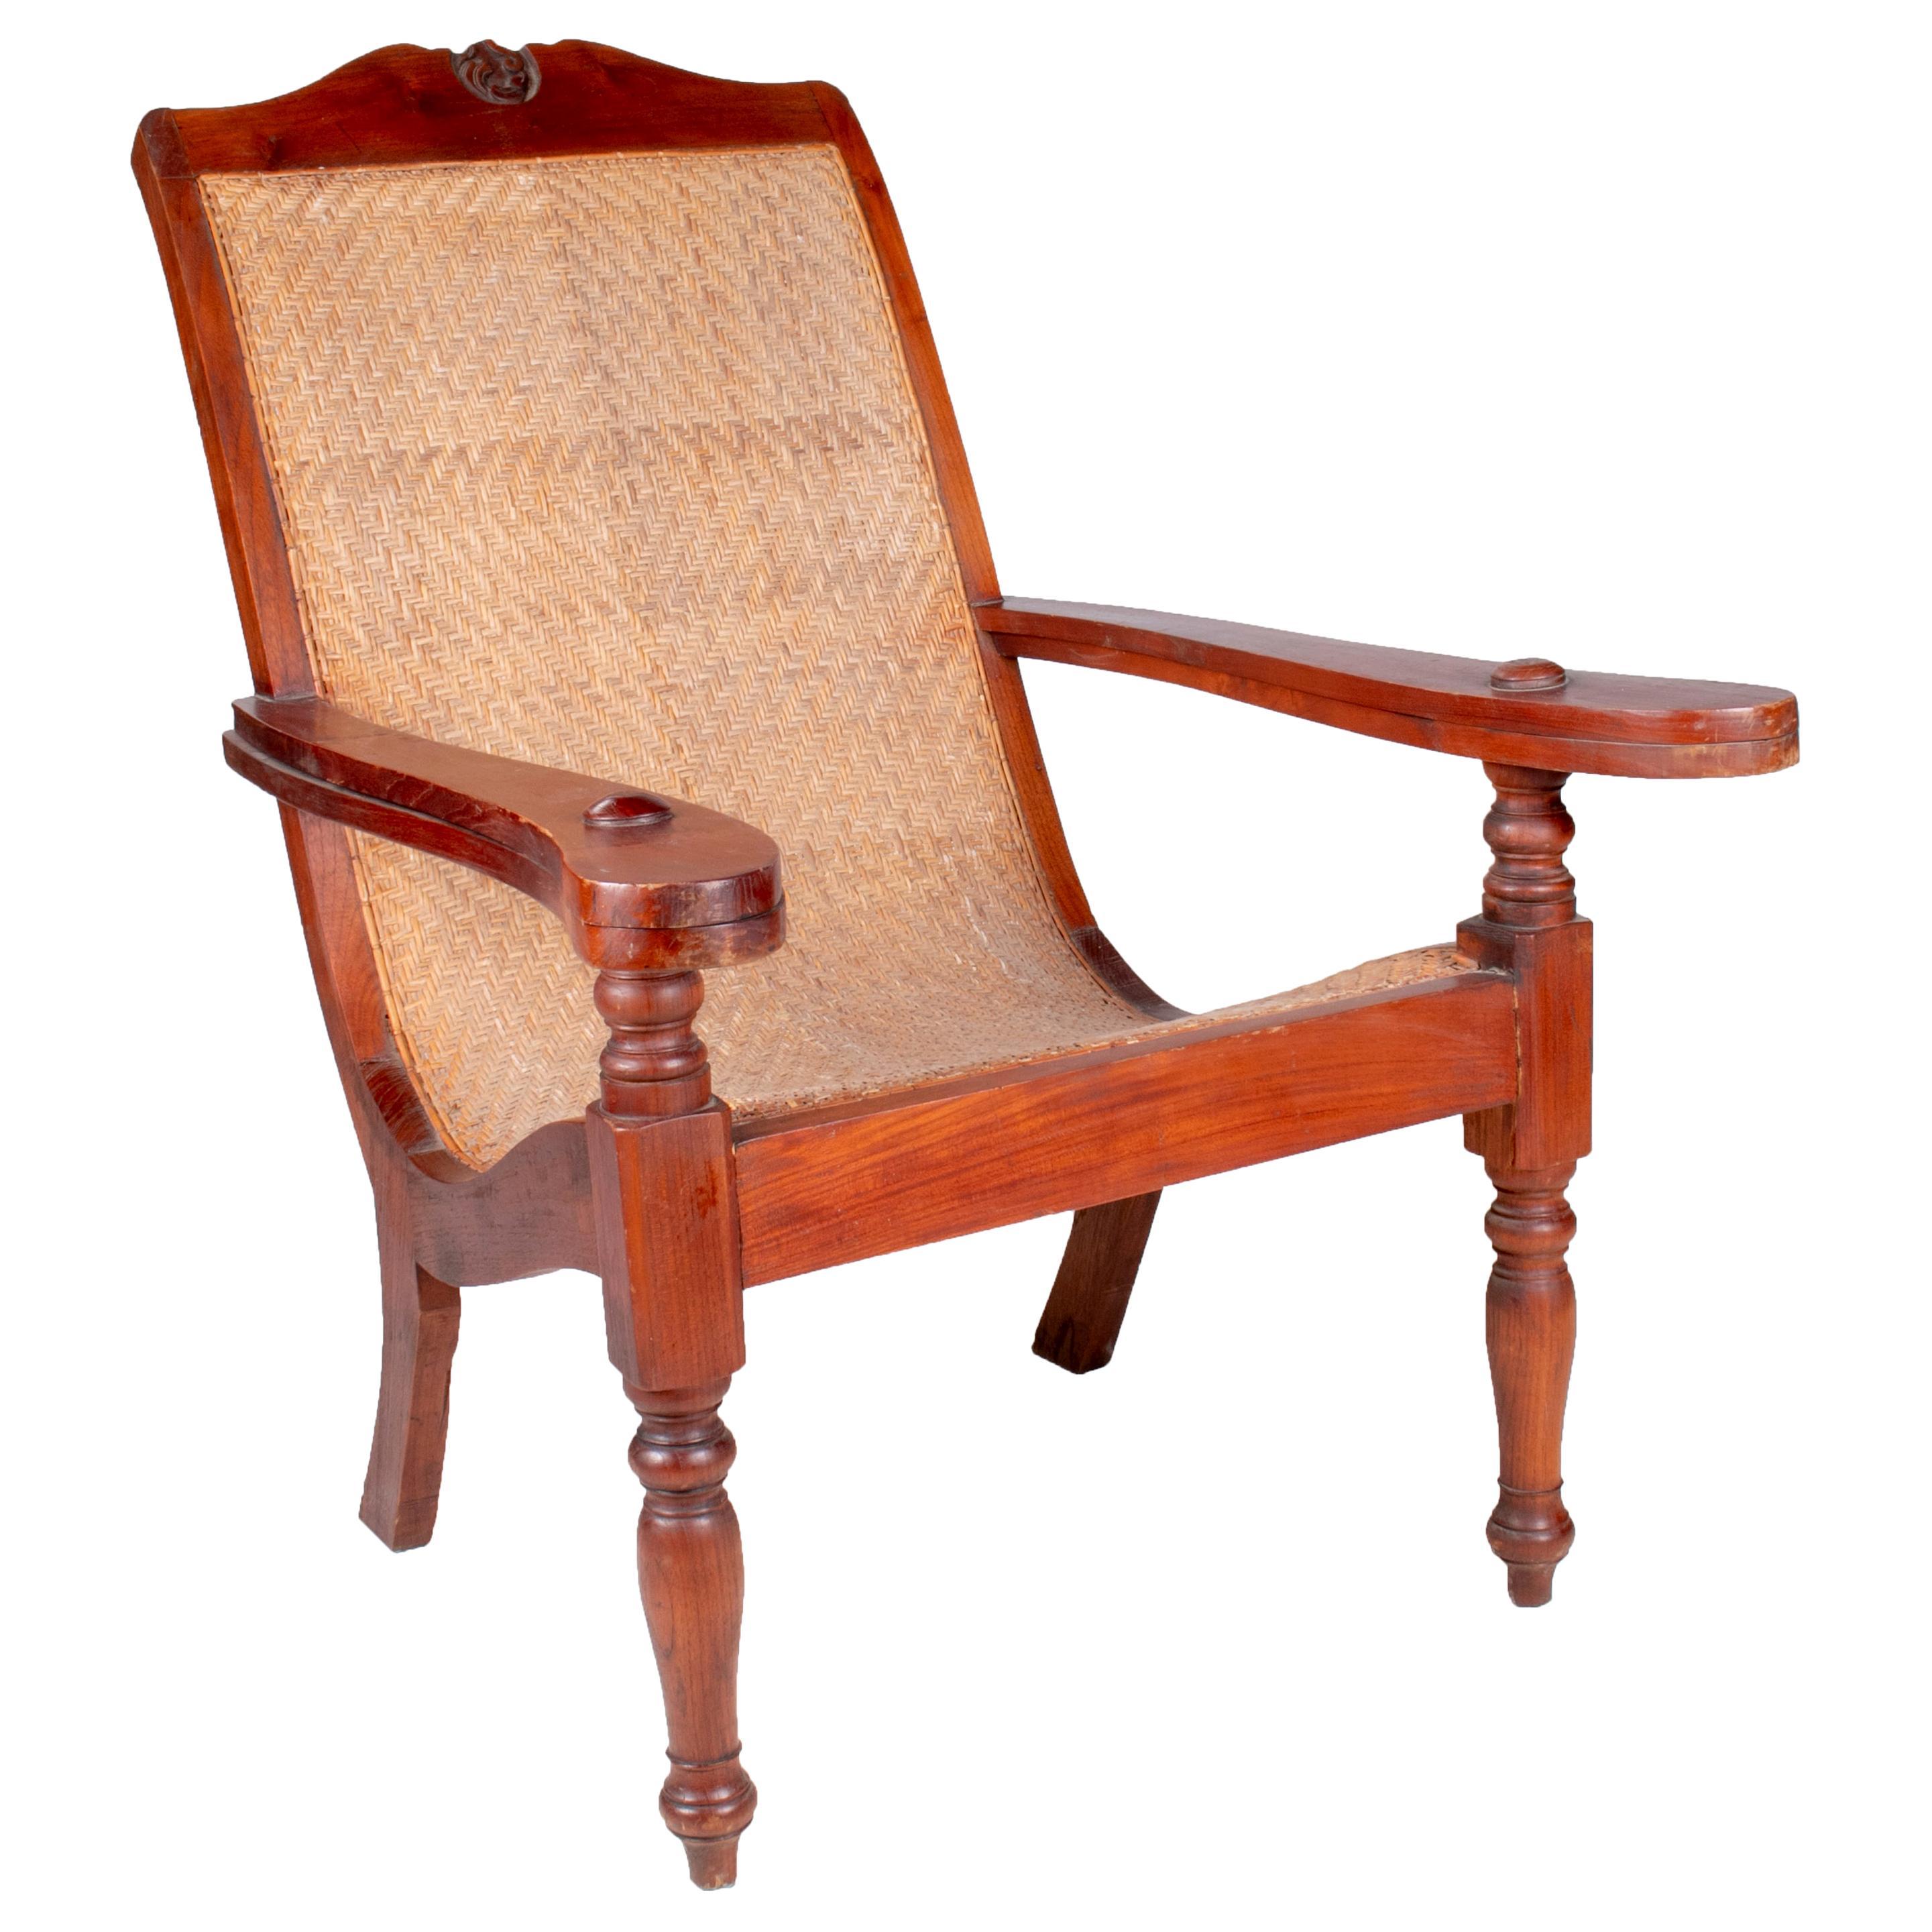 1990s European Mahogany Rattan Lace Cane Armchair